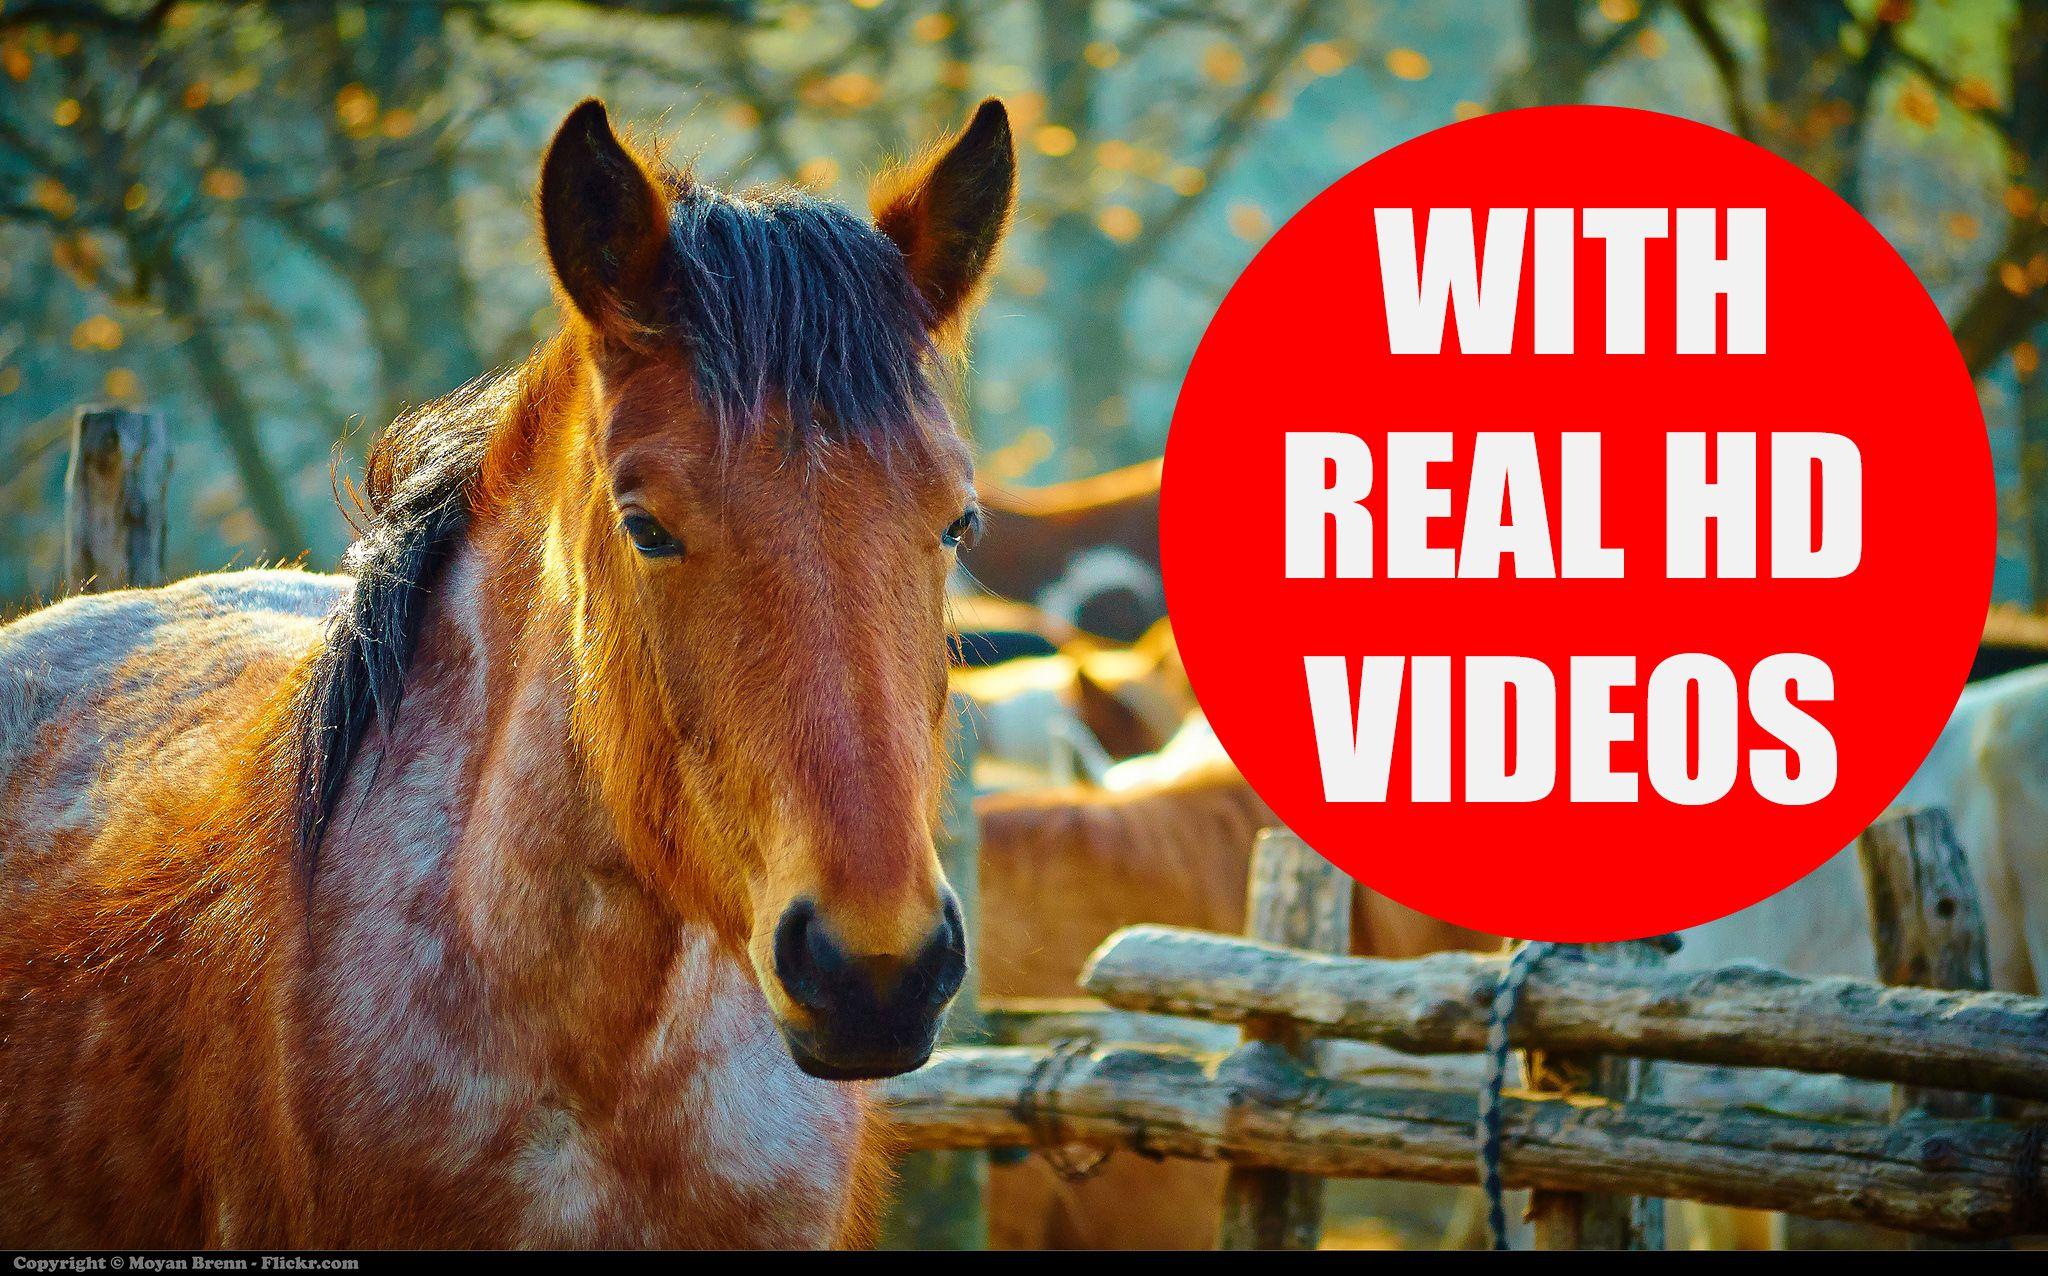 This educational video teaches children popular farm